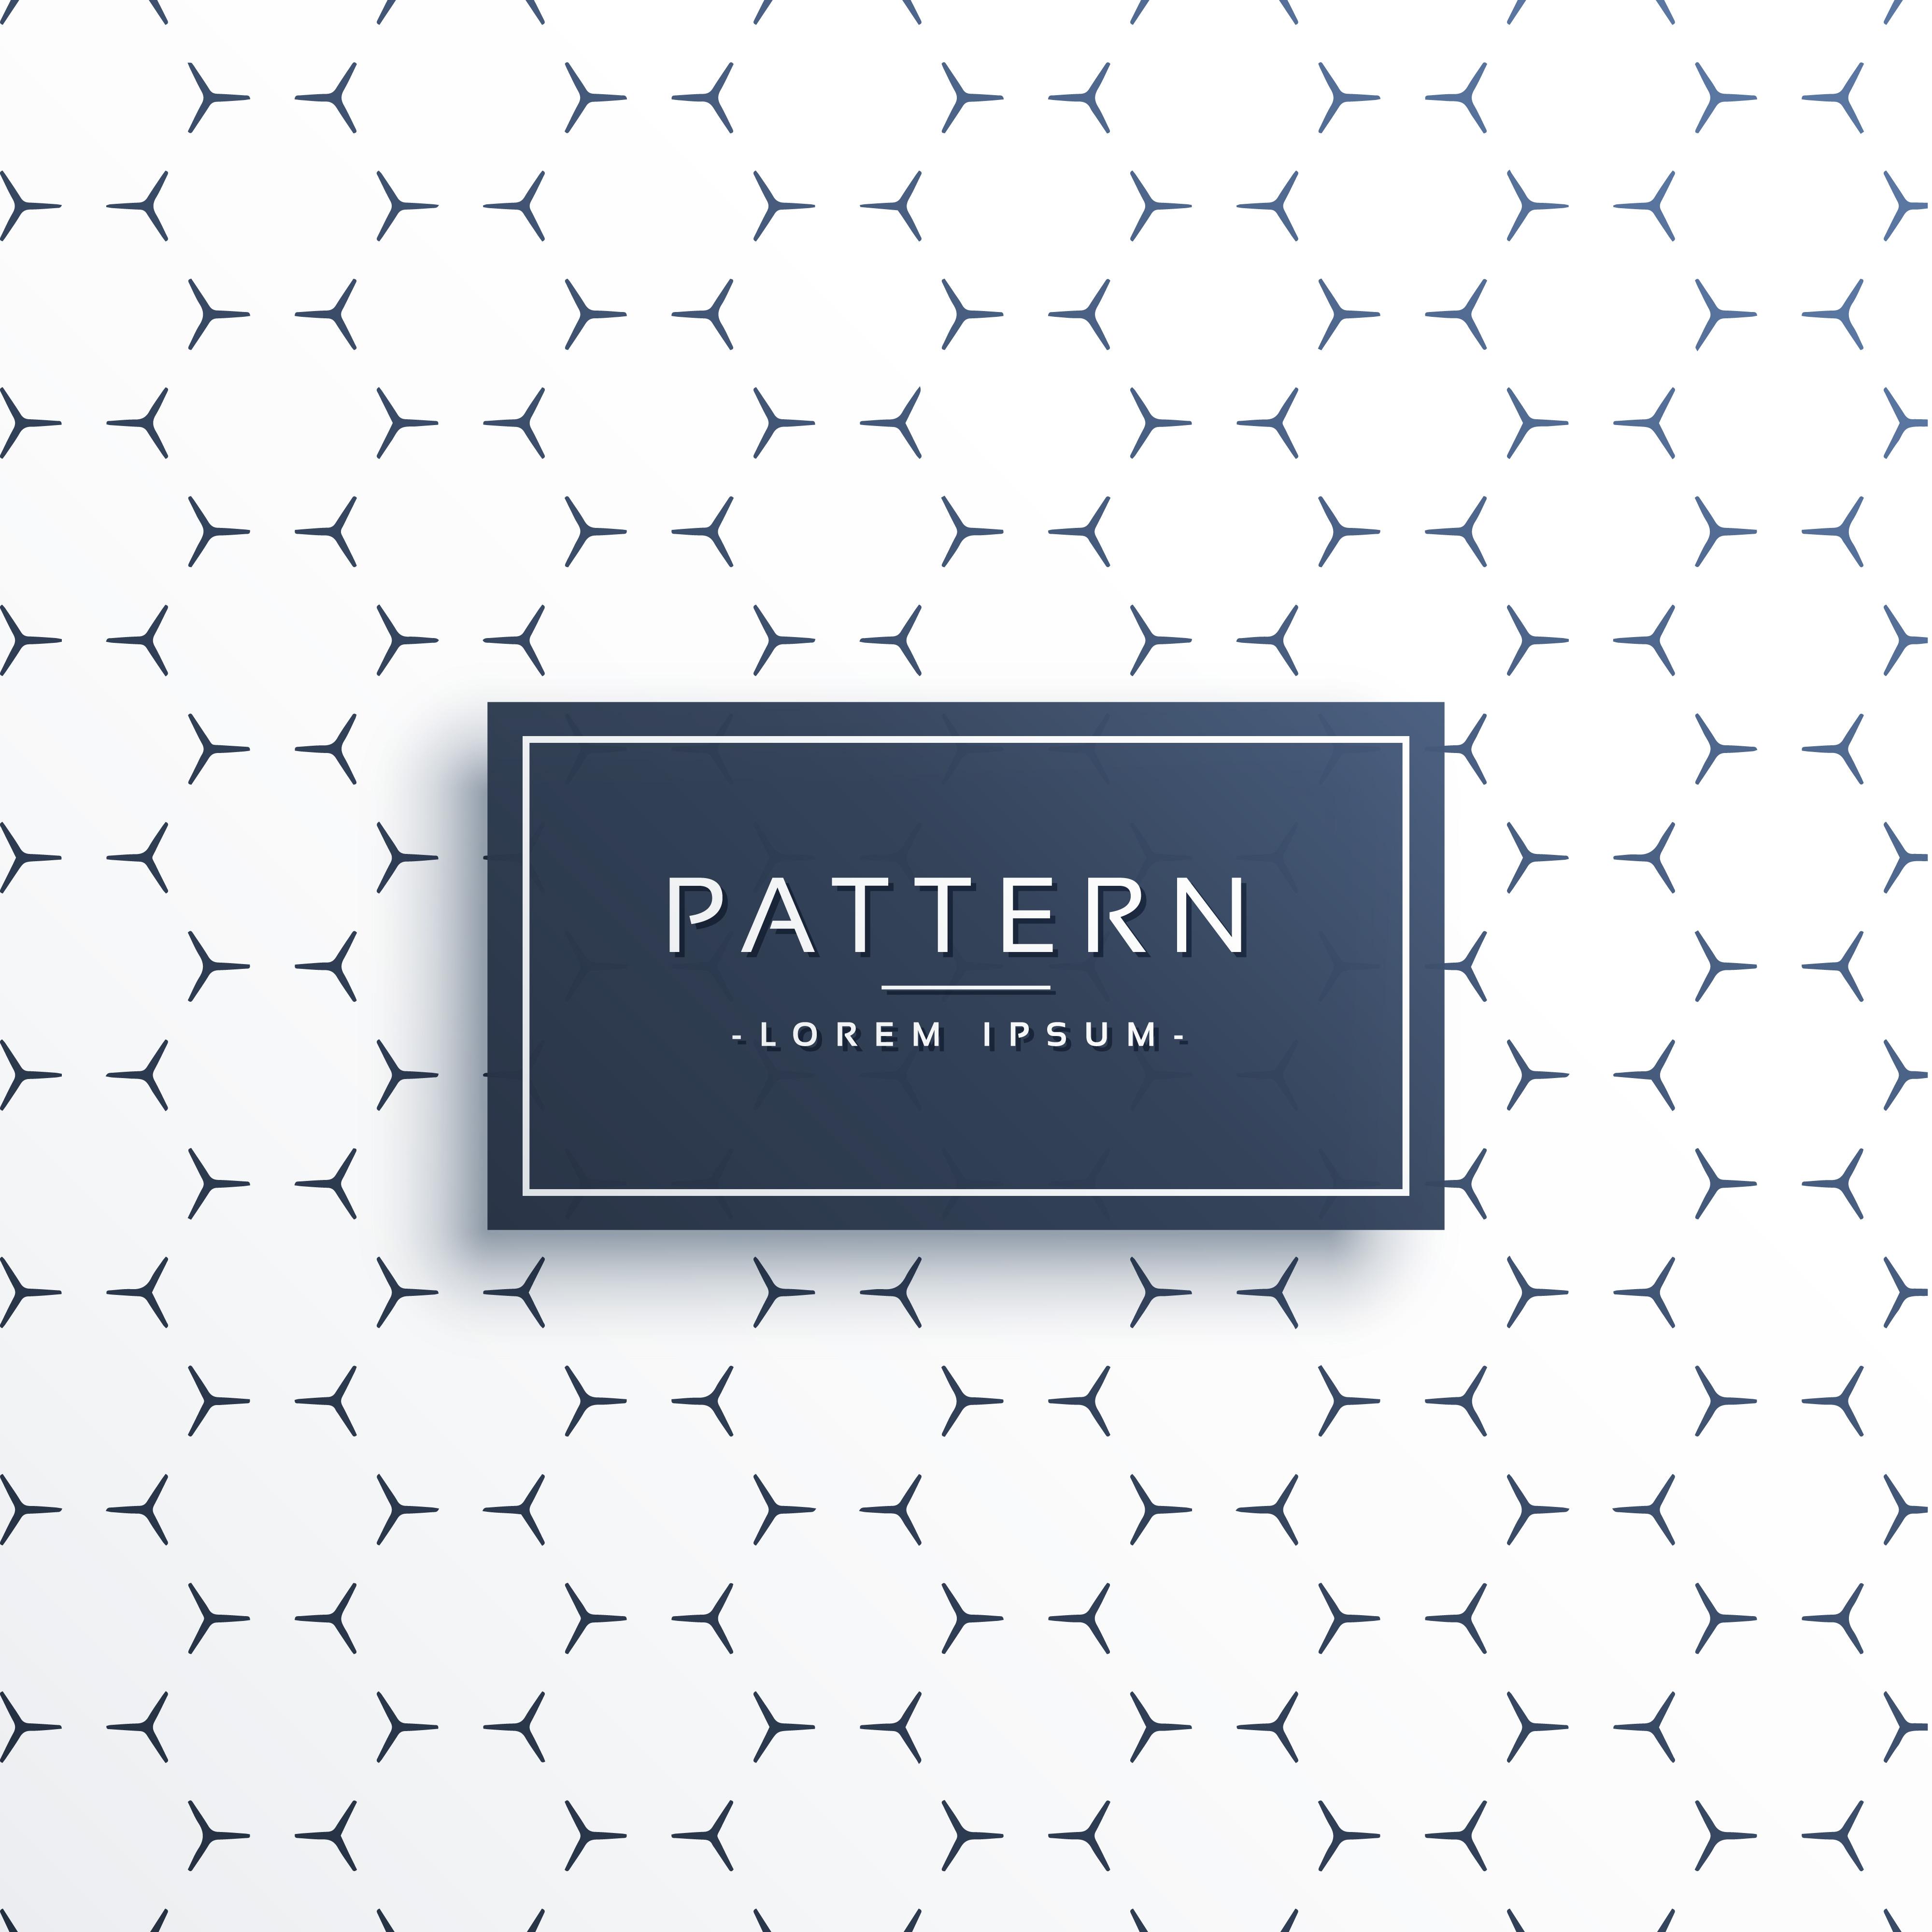 Minimal pattern vector design background download free for Minimal art vector